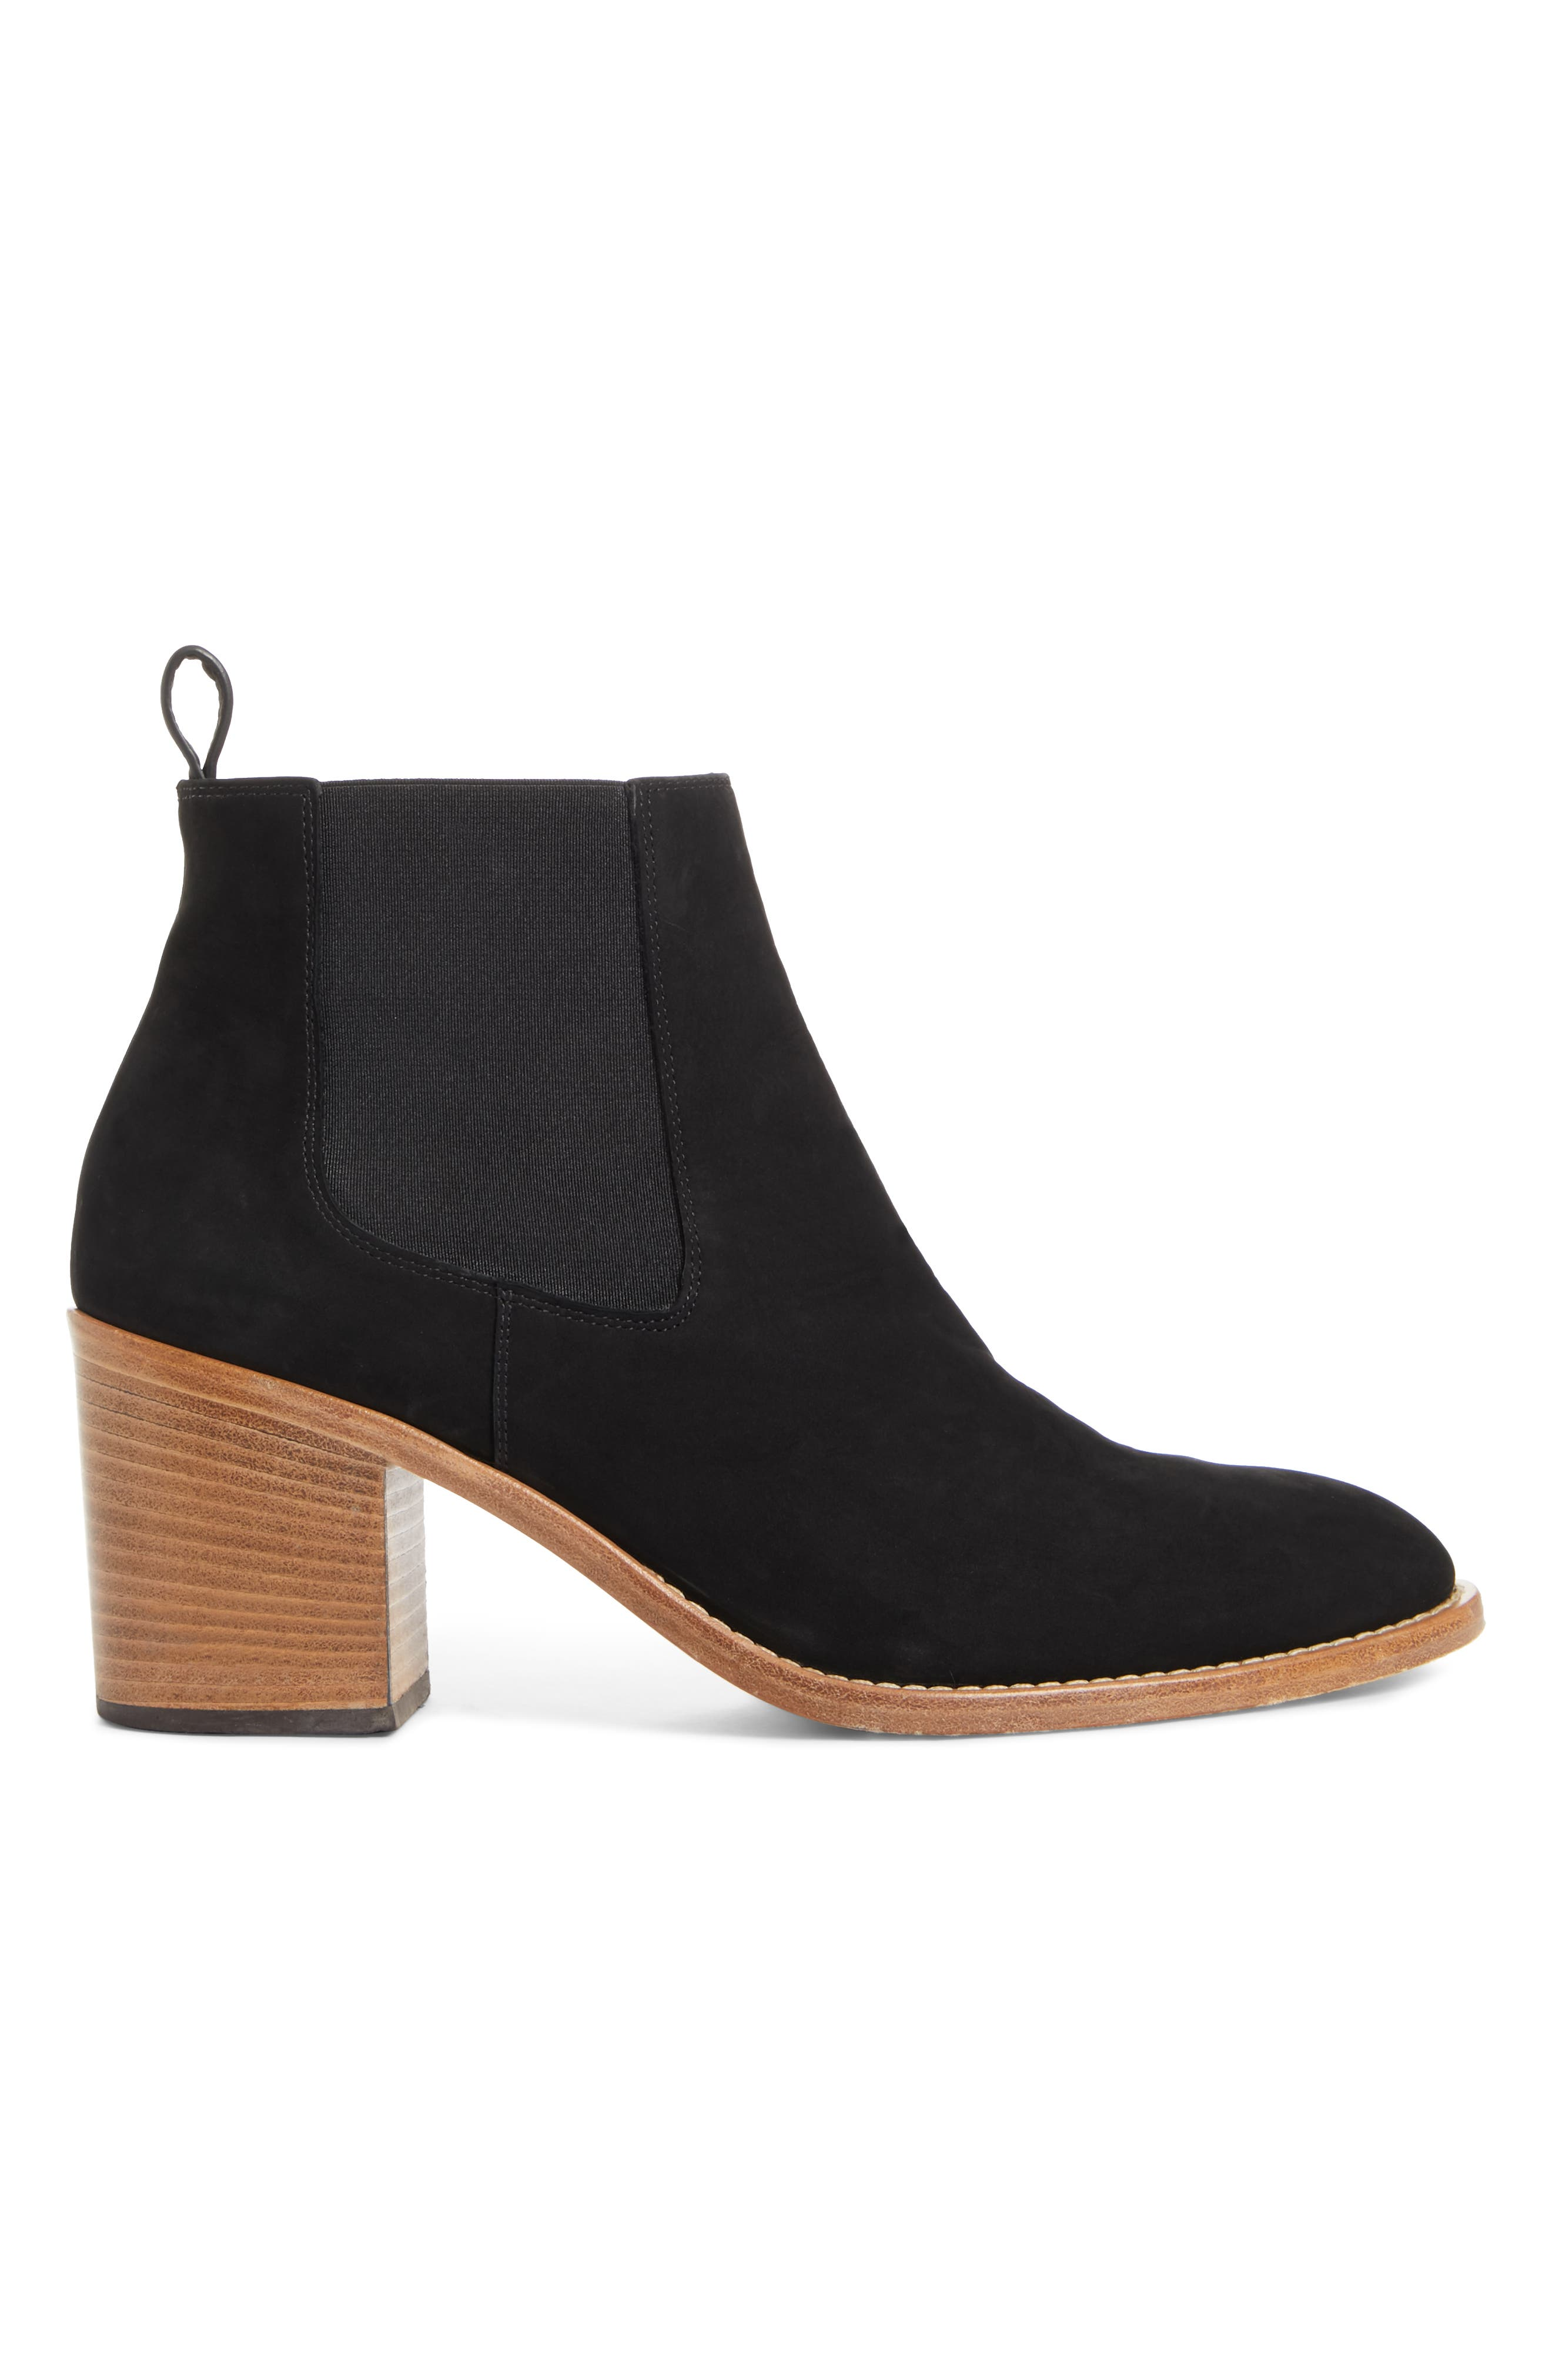 686ad4c4b02 Women's Shoes Sale | Nordstrom